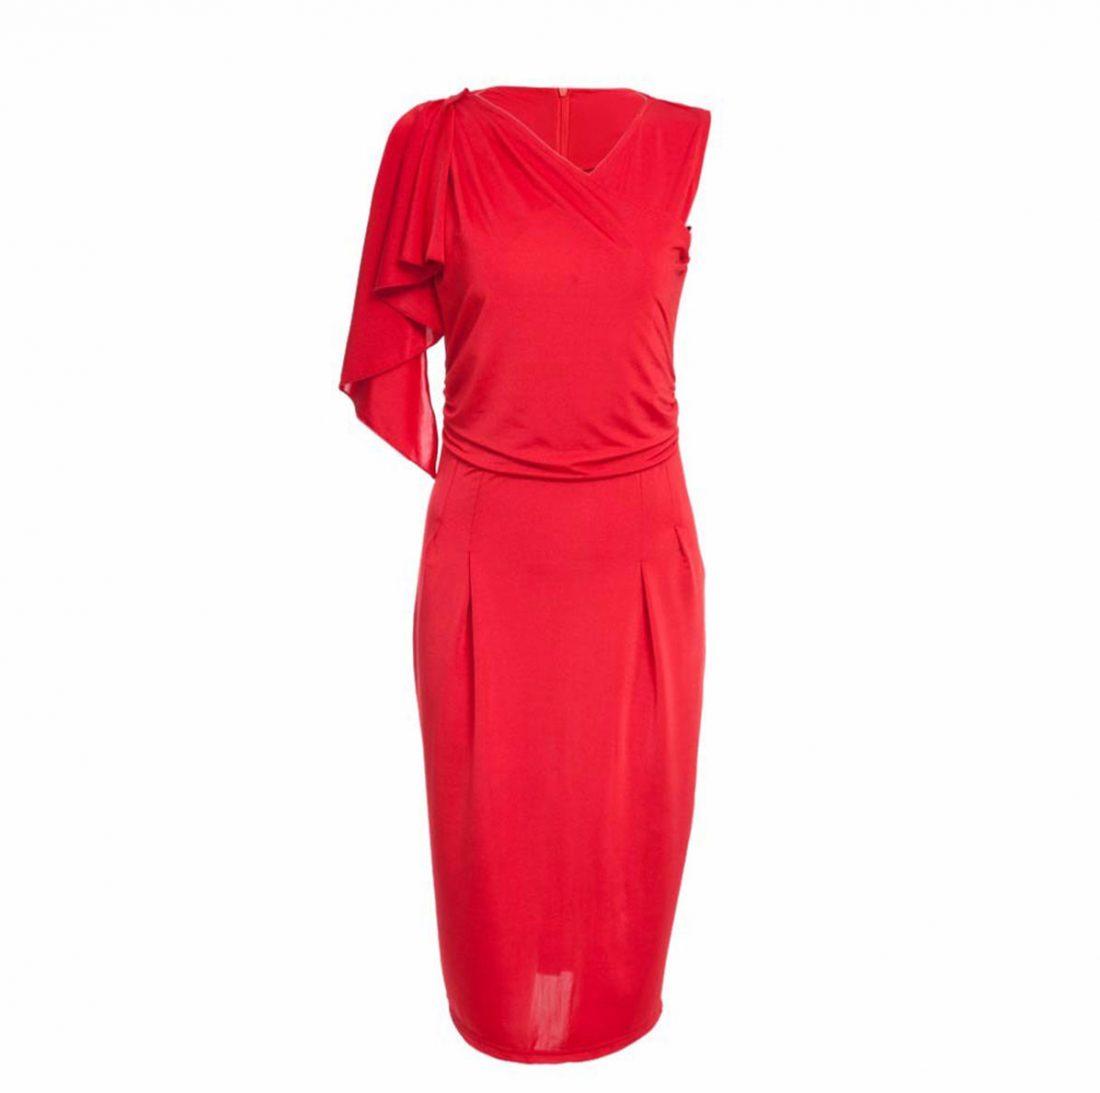 M0188 red5 Short Sleeve Dresses maureens.com boutique